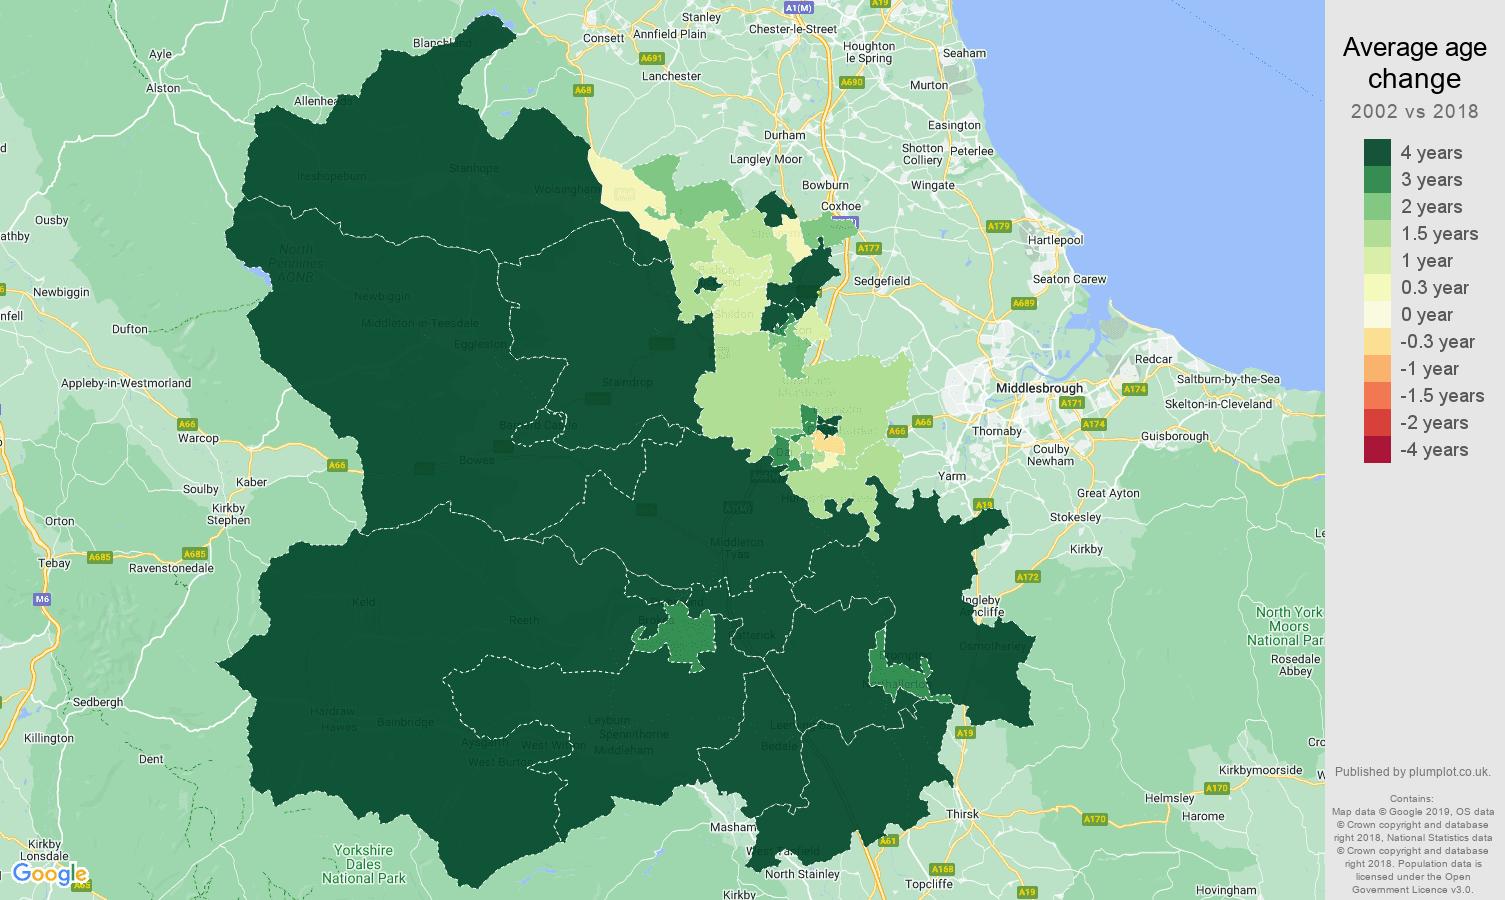 Darlington average age change map